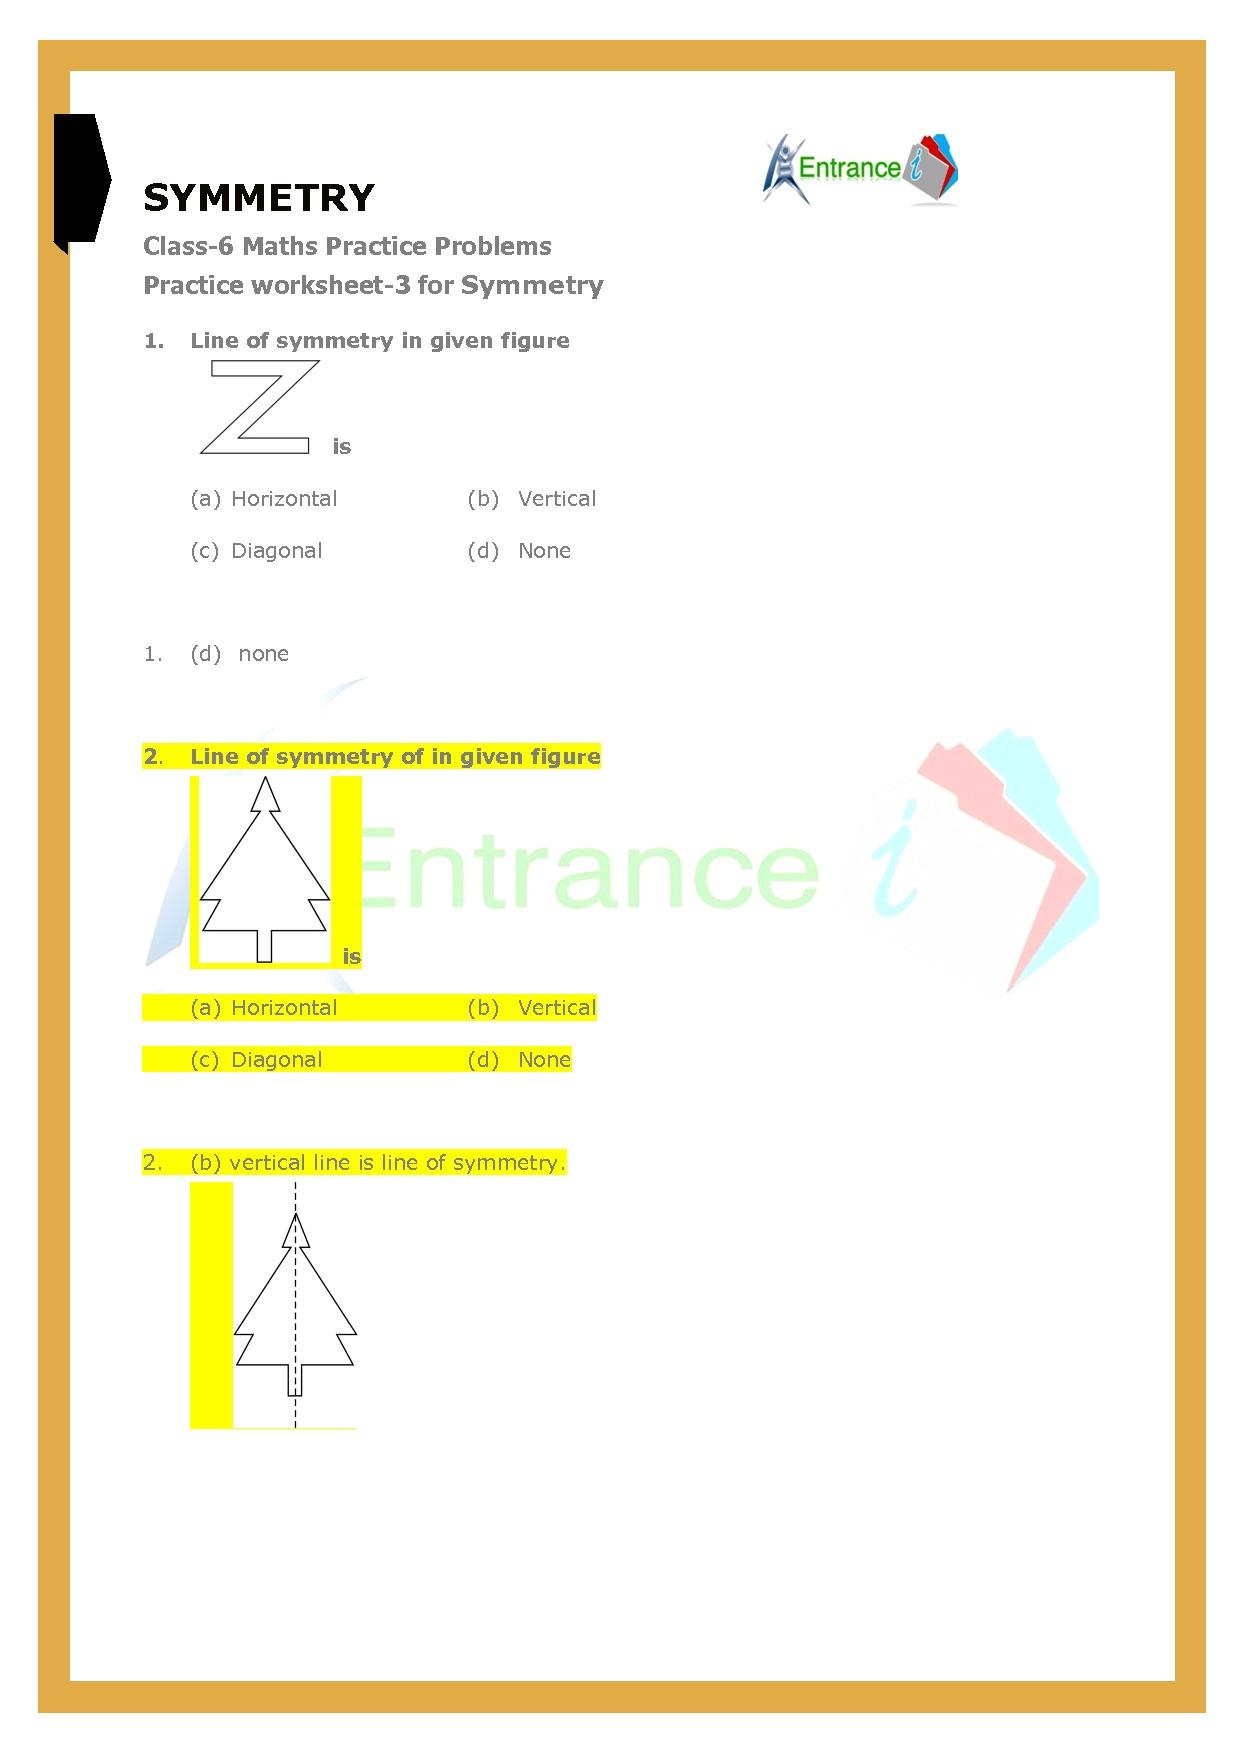 Class 6 Maths Chapter 13 Symmetry Worksheet 3 Entrancei [ 1754 x 1240 Pixel ]